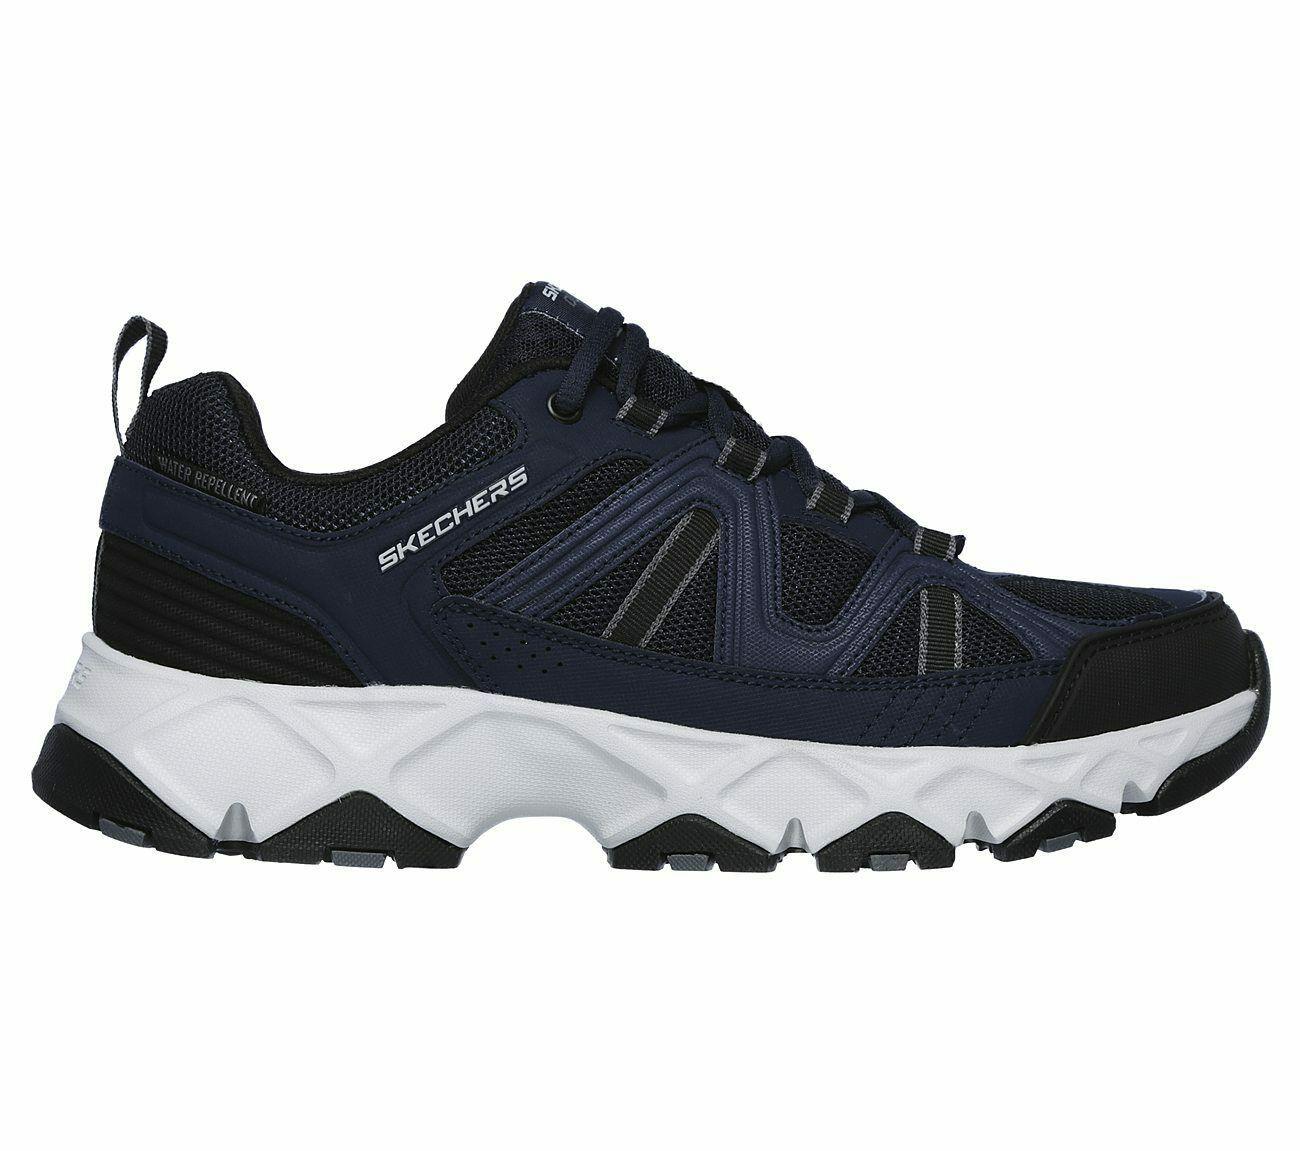 Skechers Navy Black Extra Wide Fit Shoe Men Memory Foam Sport Comfort Soft 51885 image 2